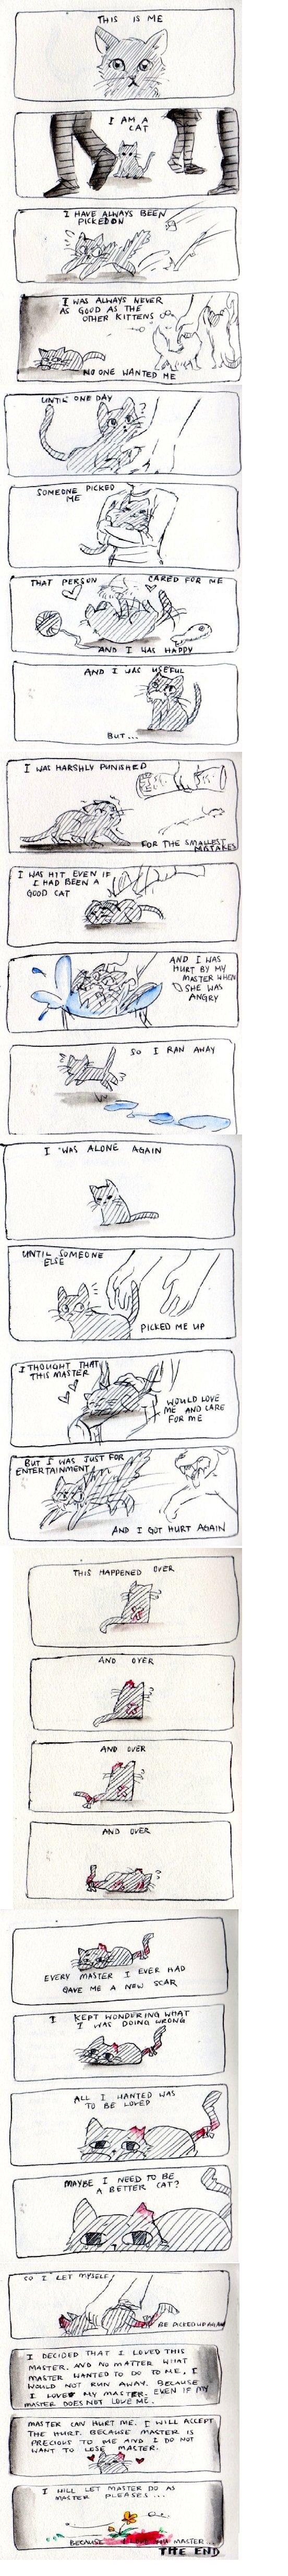 i'm a cat. credit: .. Terrible day for rain... i'm a cat credit: Terrible day for rain